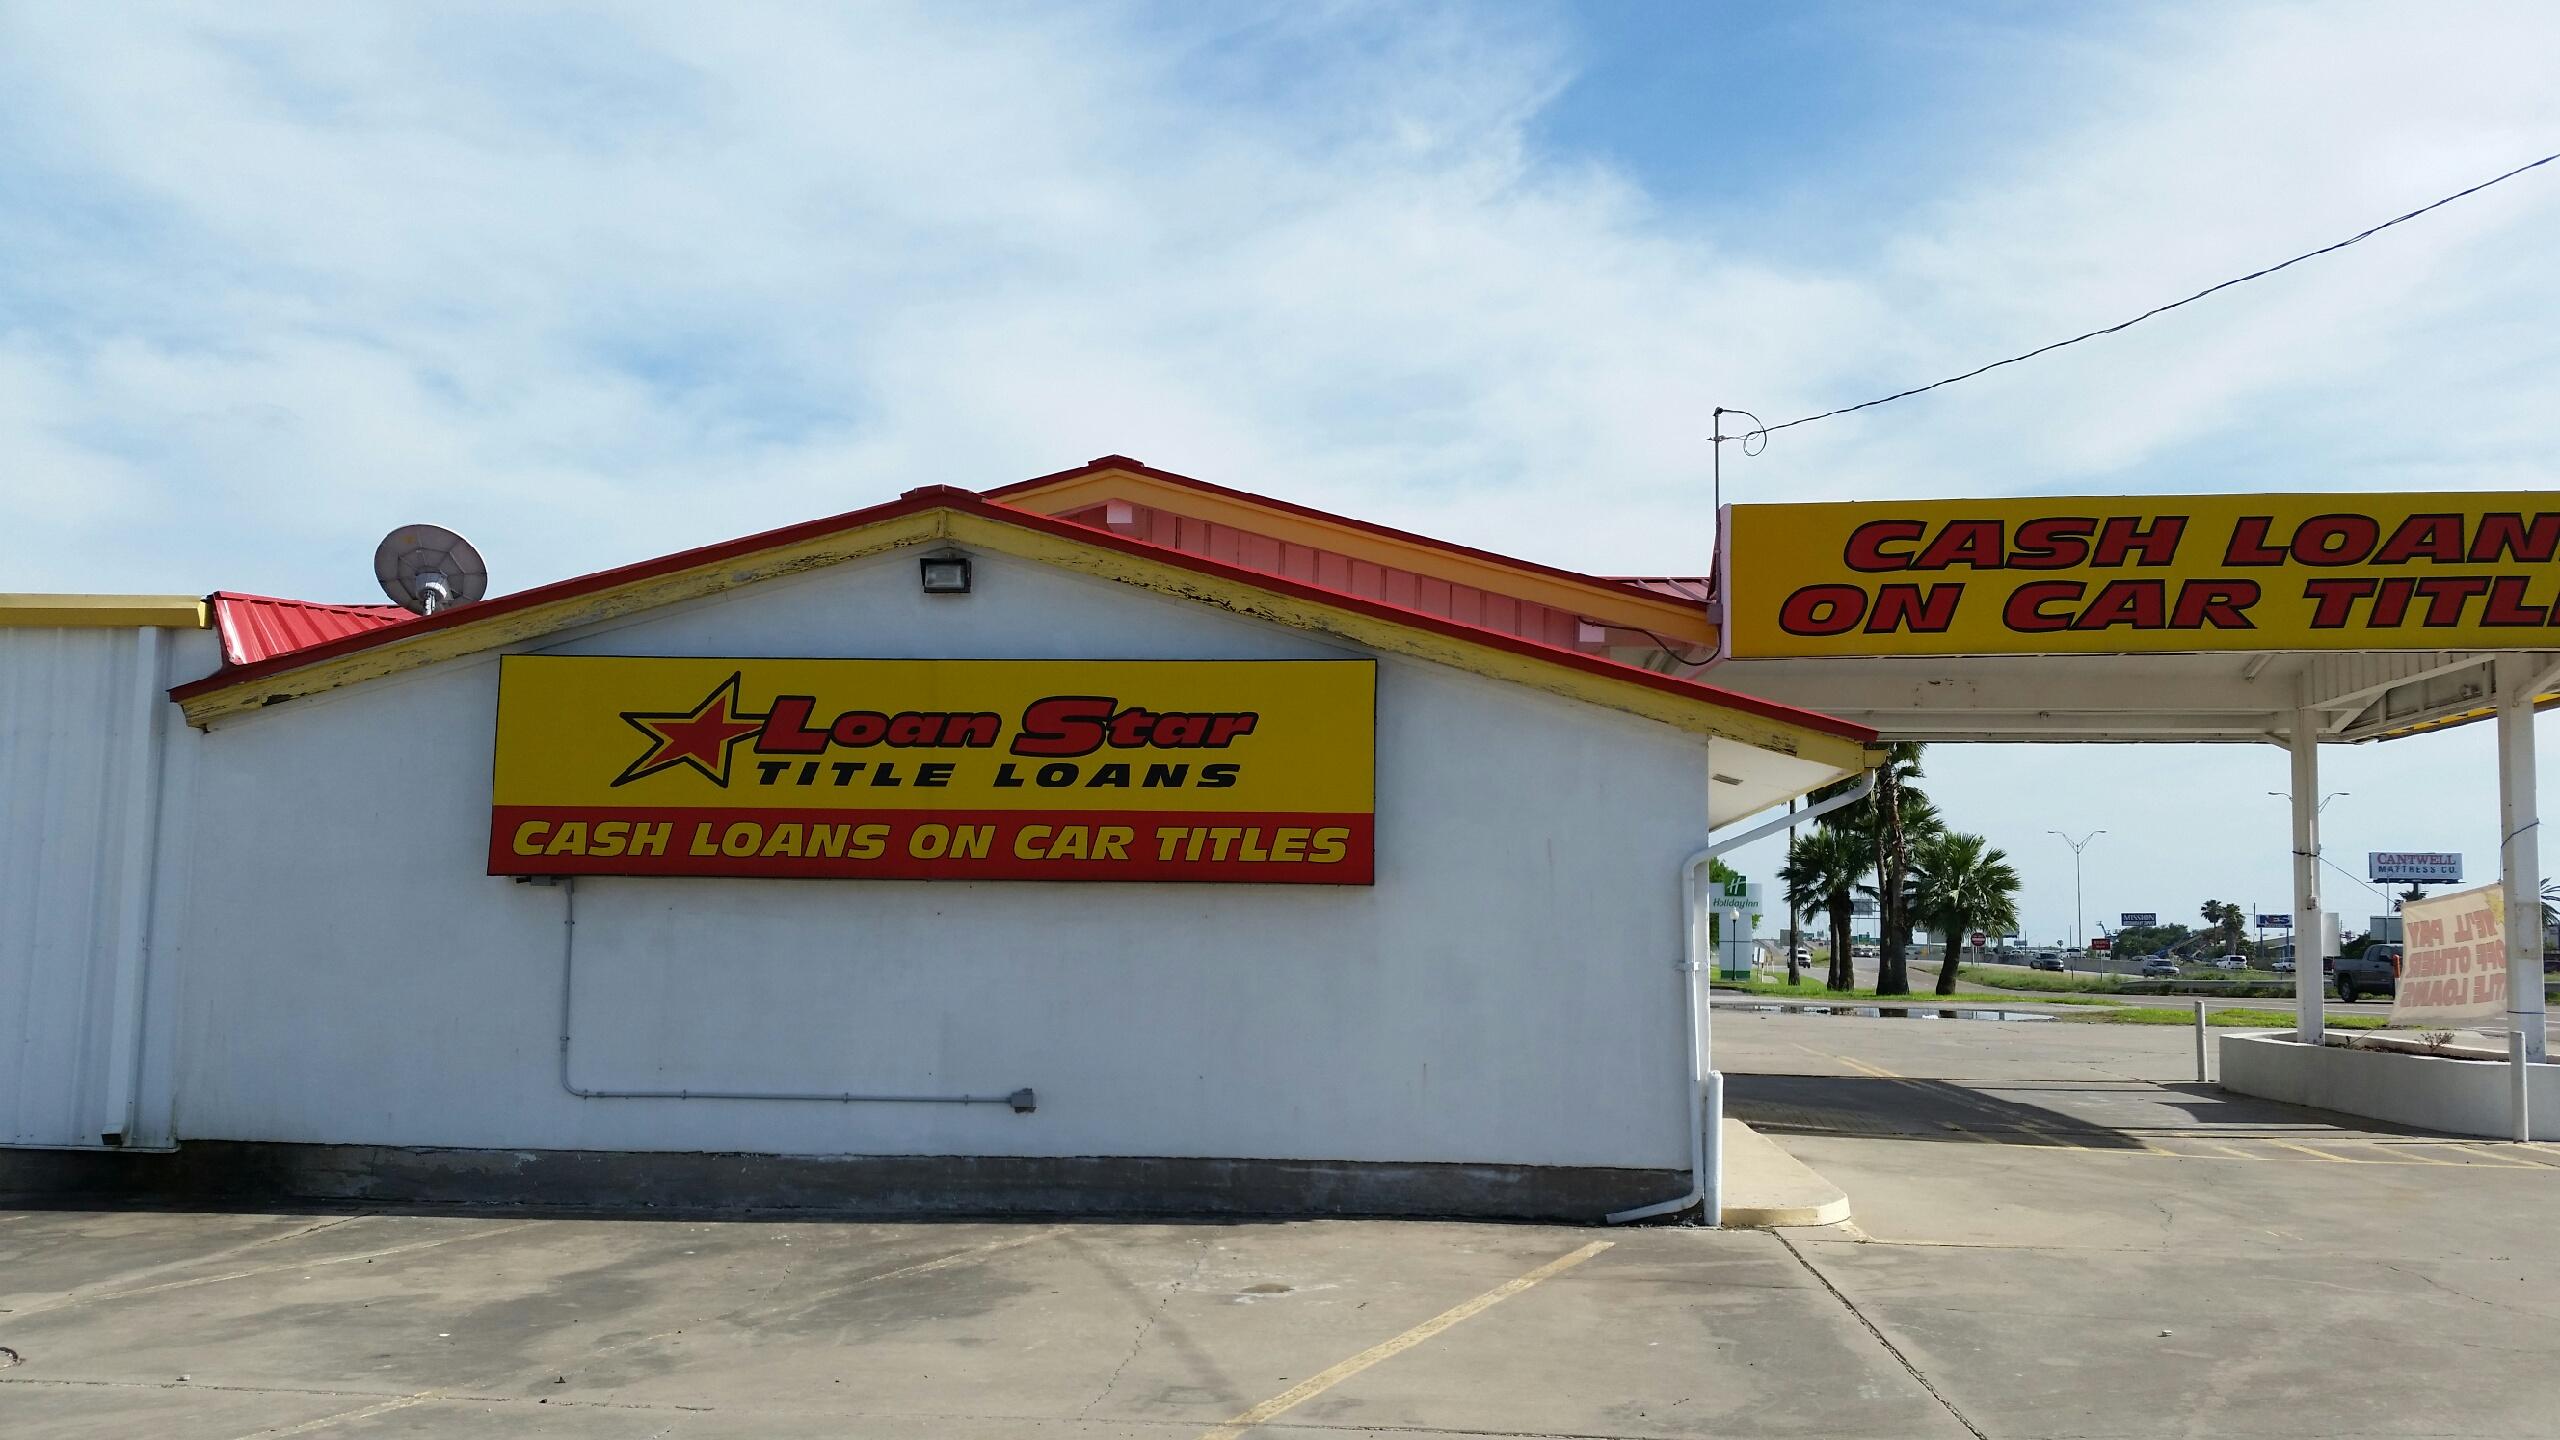 Loanstar Title Loans - Closed image 3